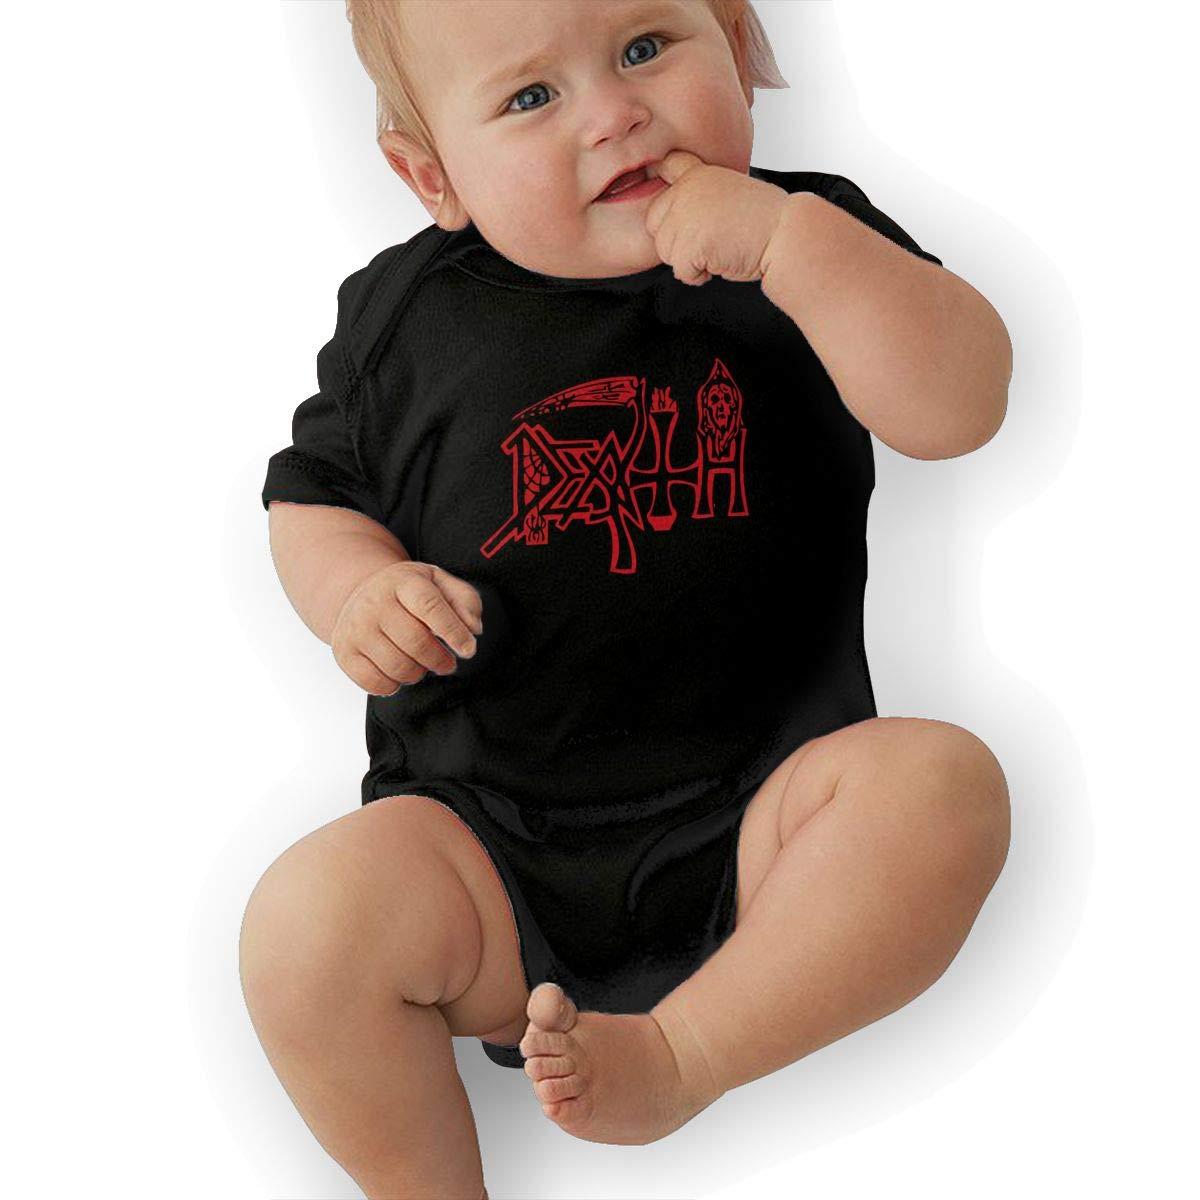 LuckyTagy Death Unisex Fashion Infant Romper Baby GirlPlaysuit Black